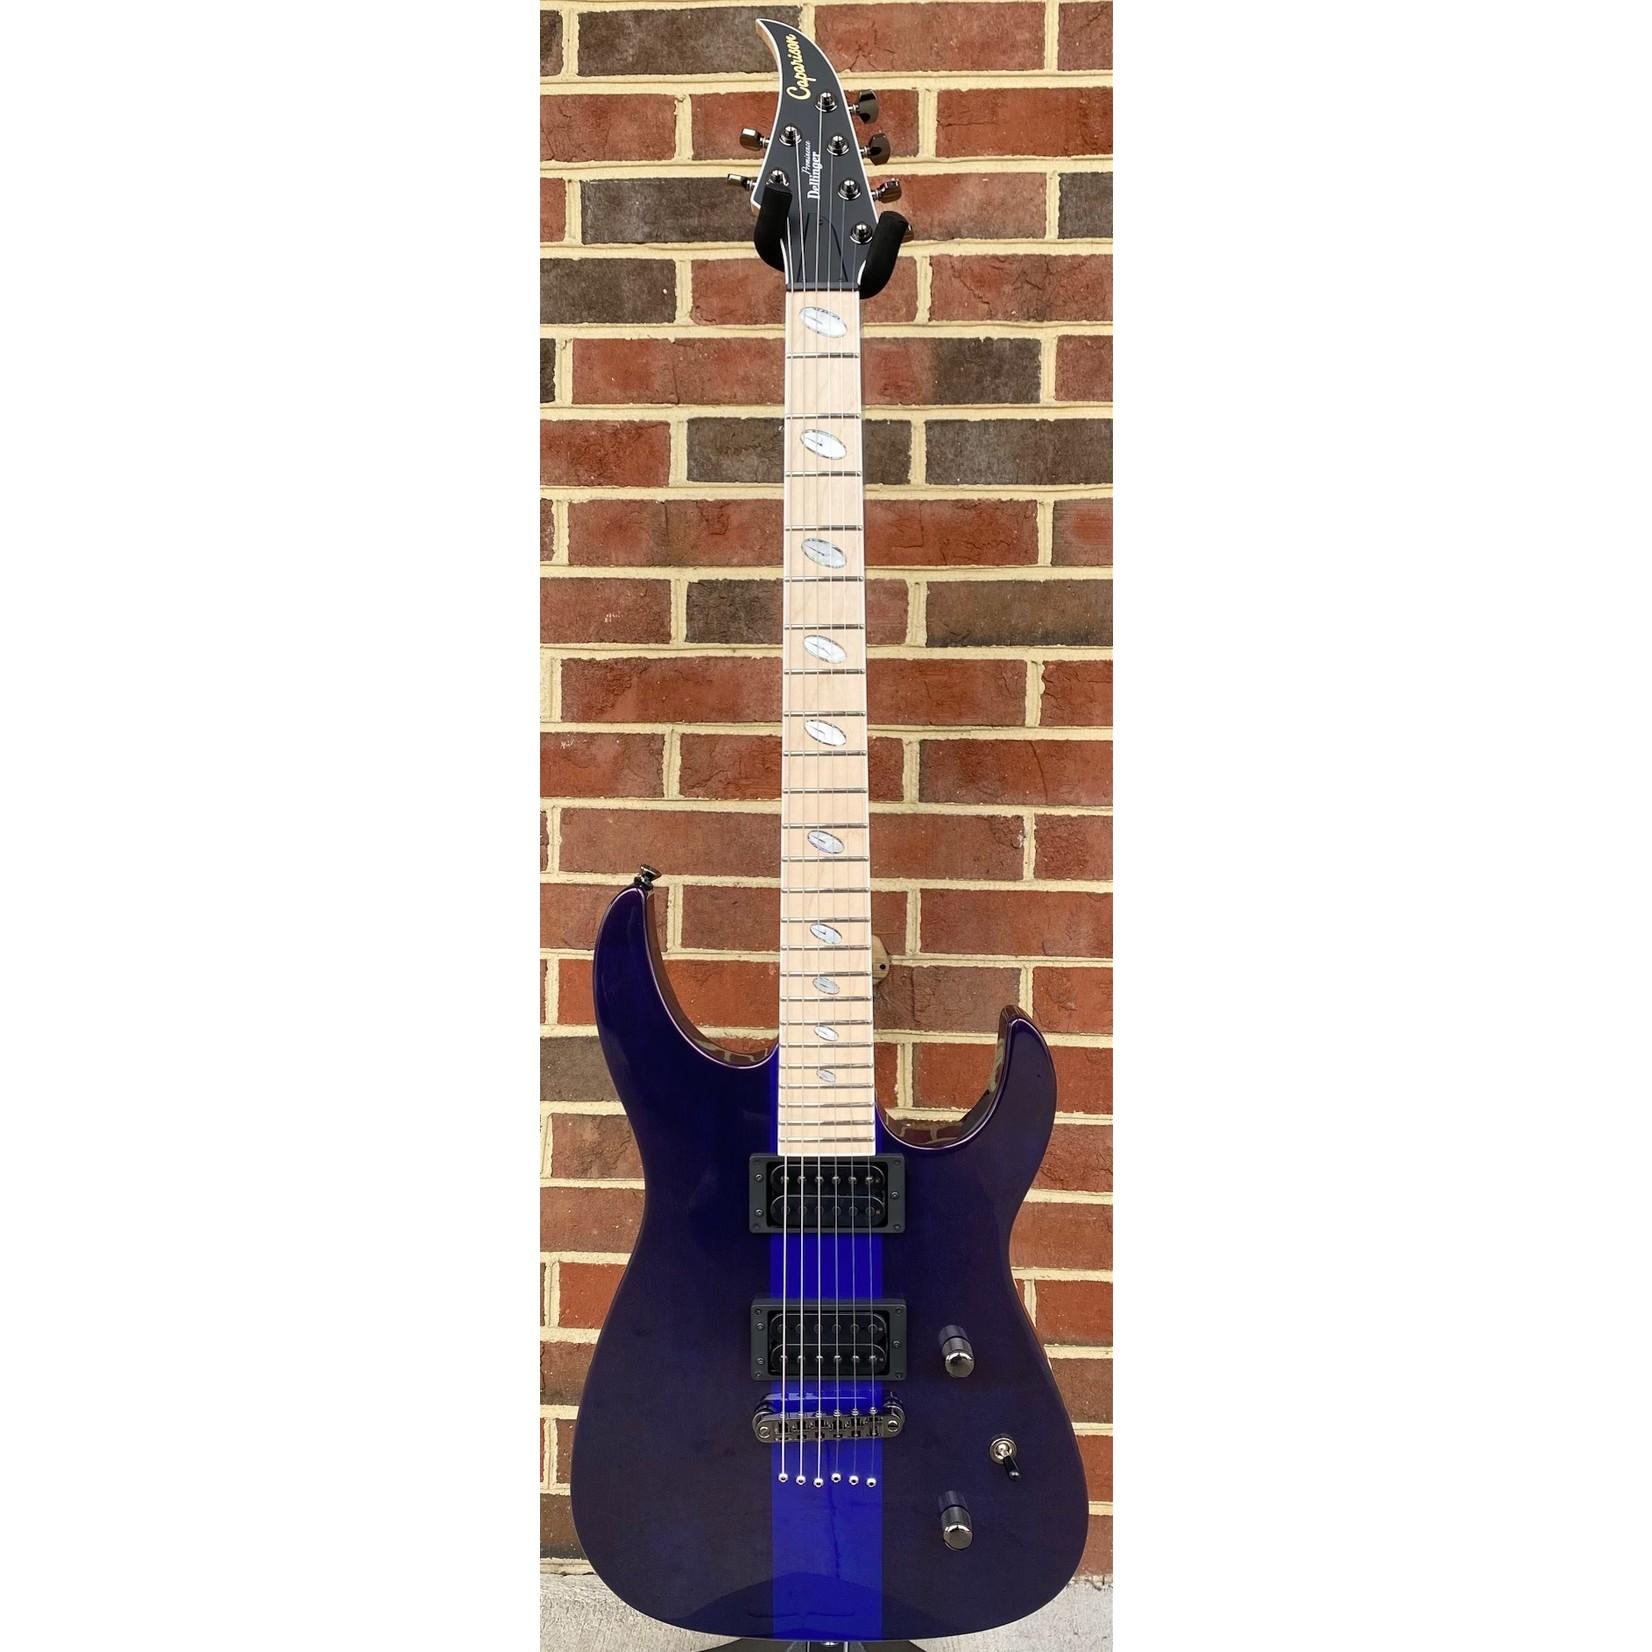 Caparison Guitars Caparison Dellinger II FX Prominence MF, Trans Spectrum Blue